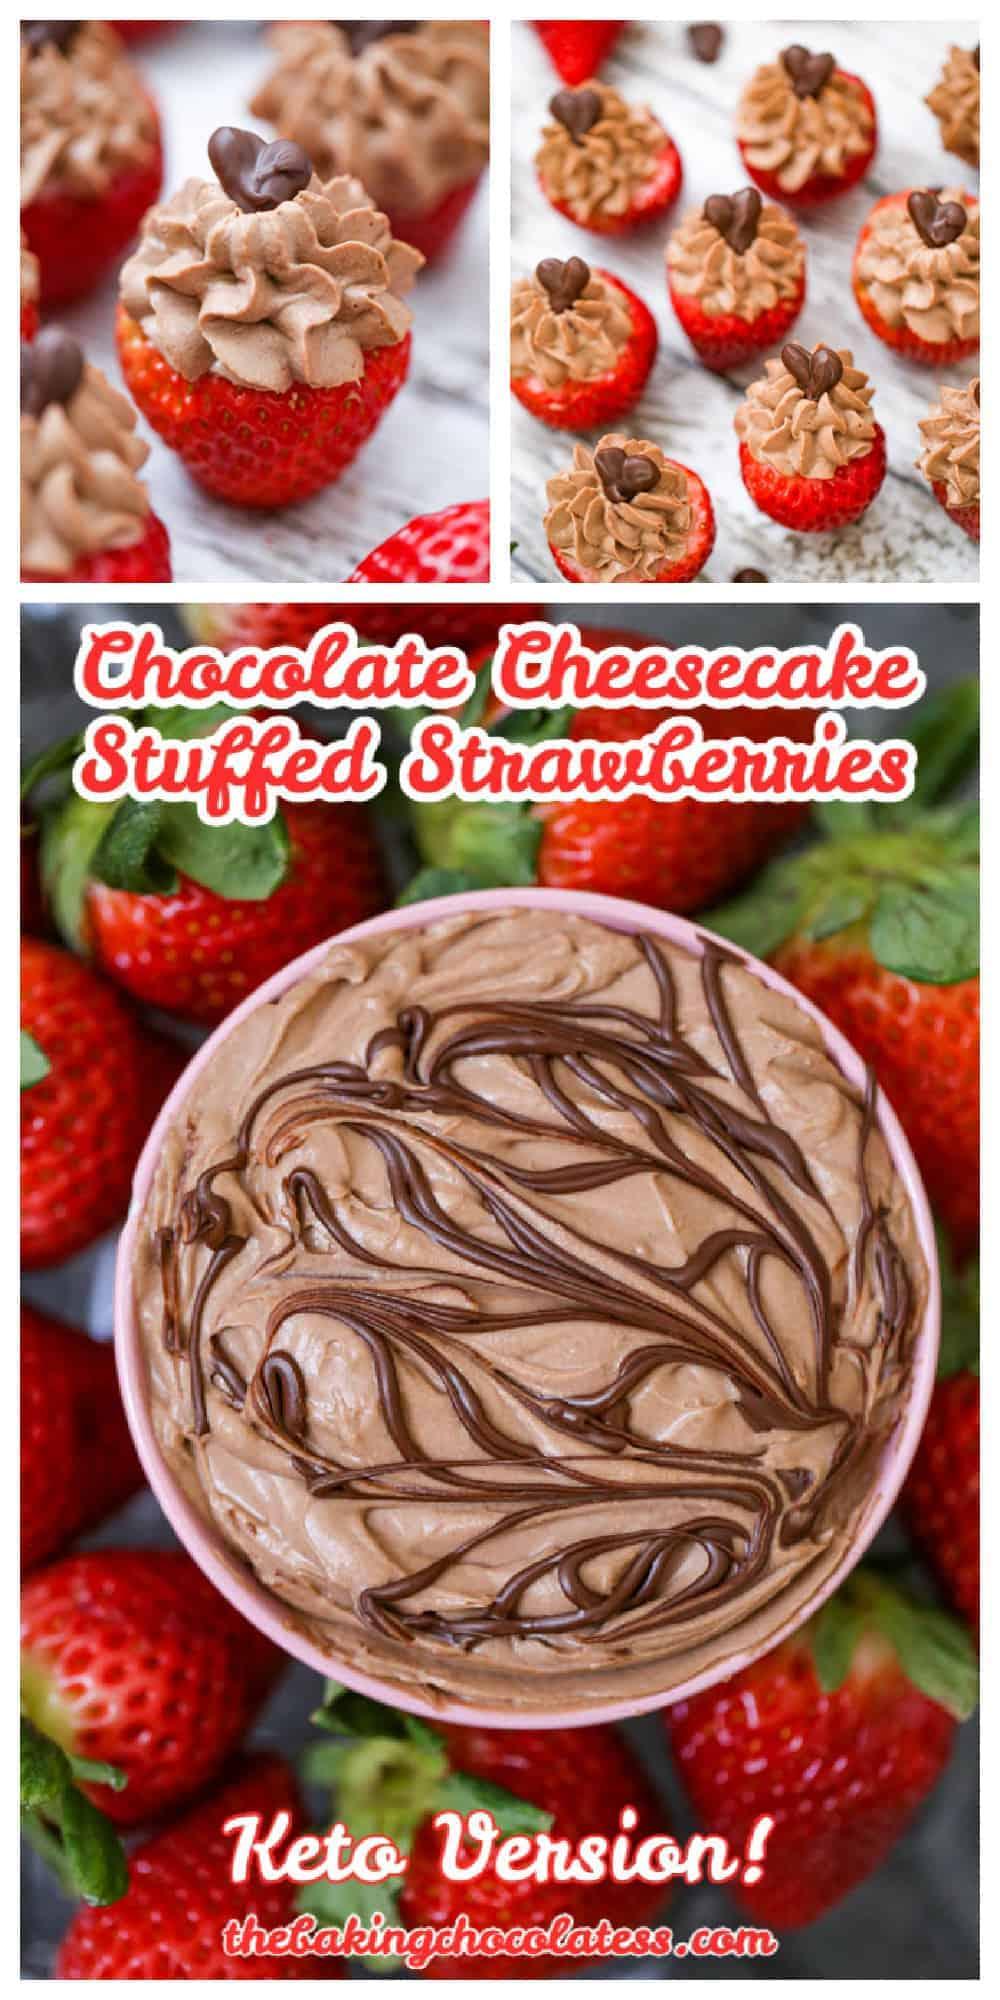 OMG Chocolate Cheesecake Stuffed Strawberries - Keto Option Too!